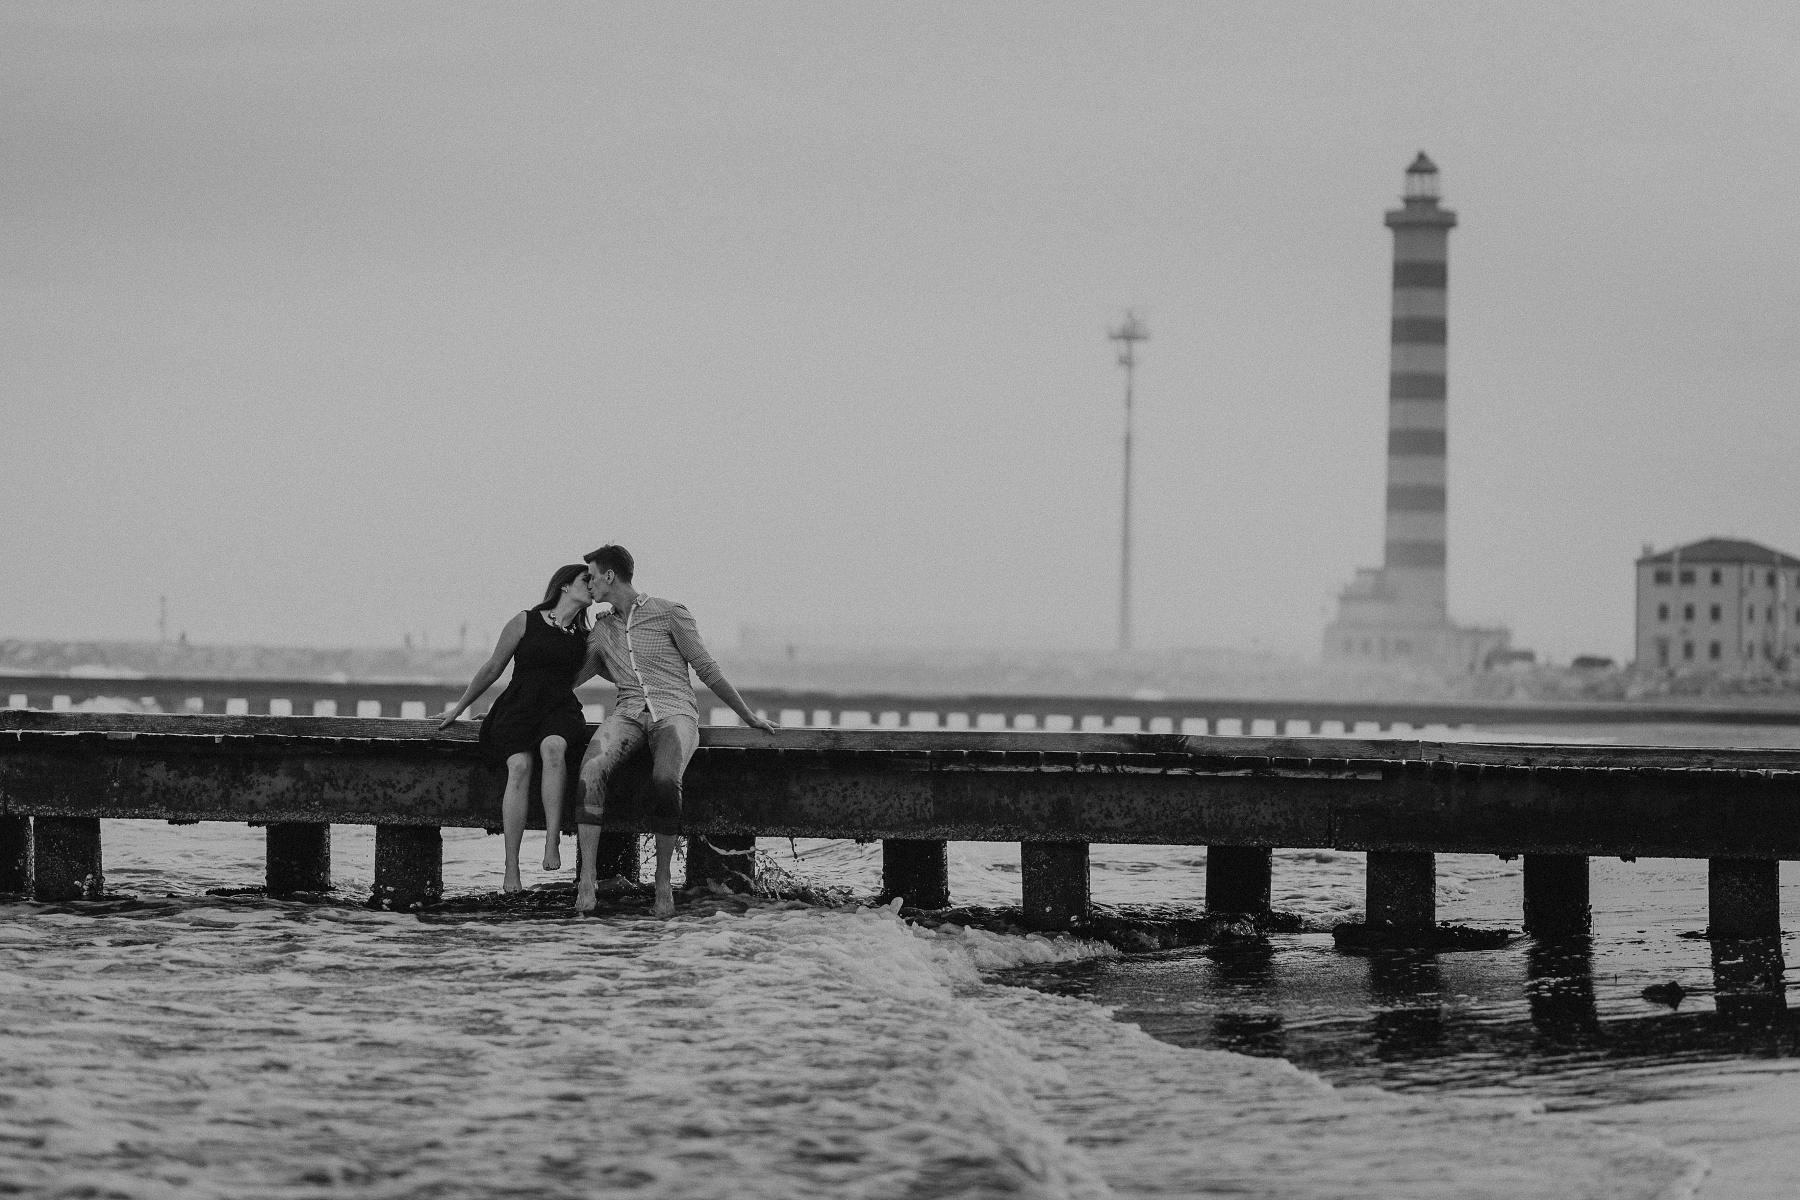 Lubos Krahulec, wedding venice, fotenie v benatkach,svadobny fotograf, fotograf vychod, slovensko, slovakia, czech, europan, presov, wedding, natural wedding portrait, best wedding photo, asociacia slovenskych svadobnych fotografov, cech fotografov, fotograf krahulec,